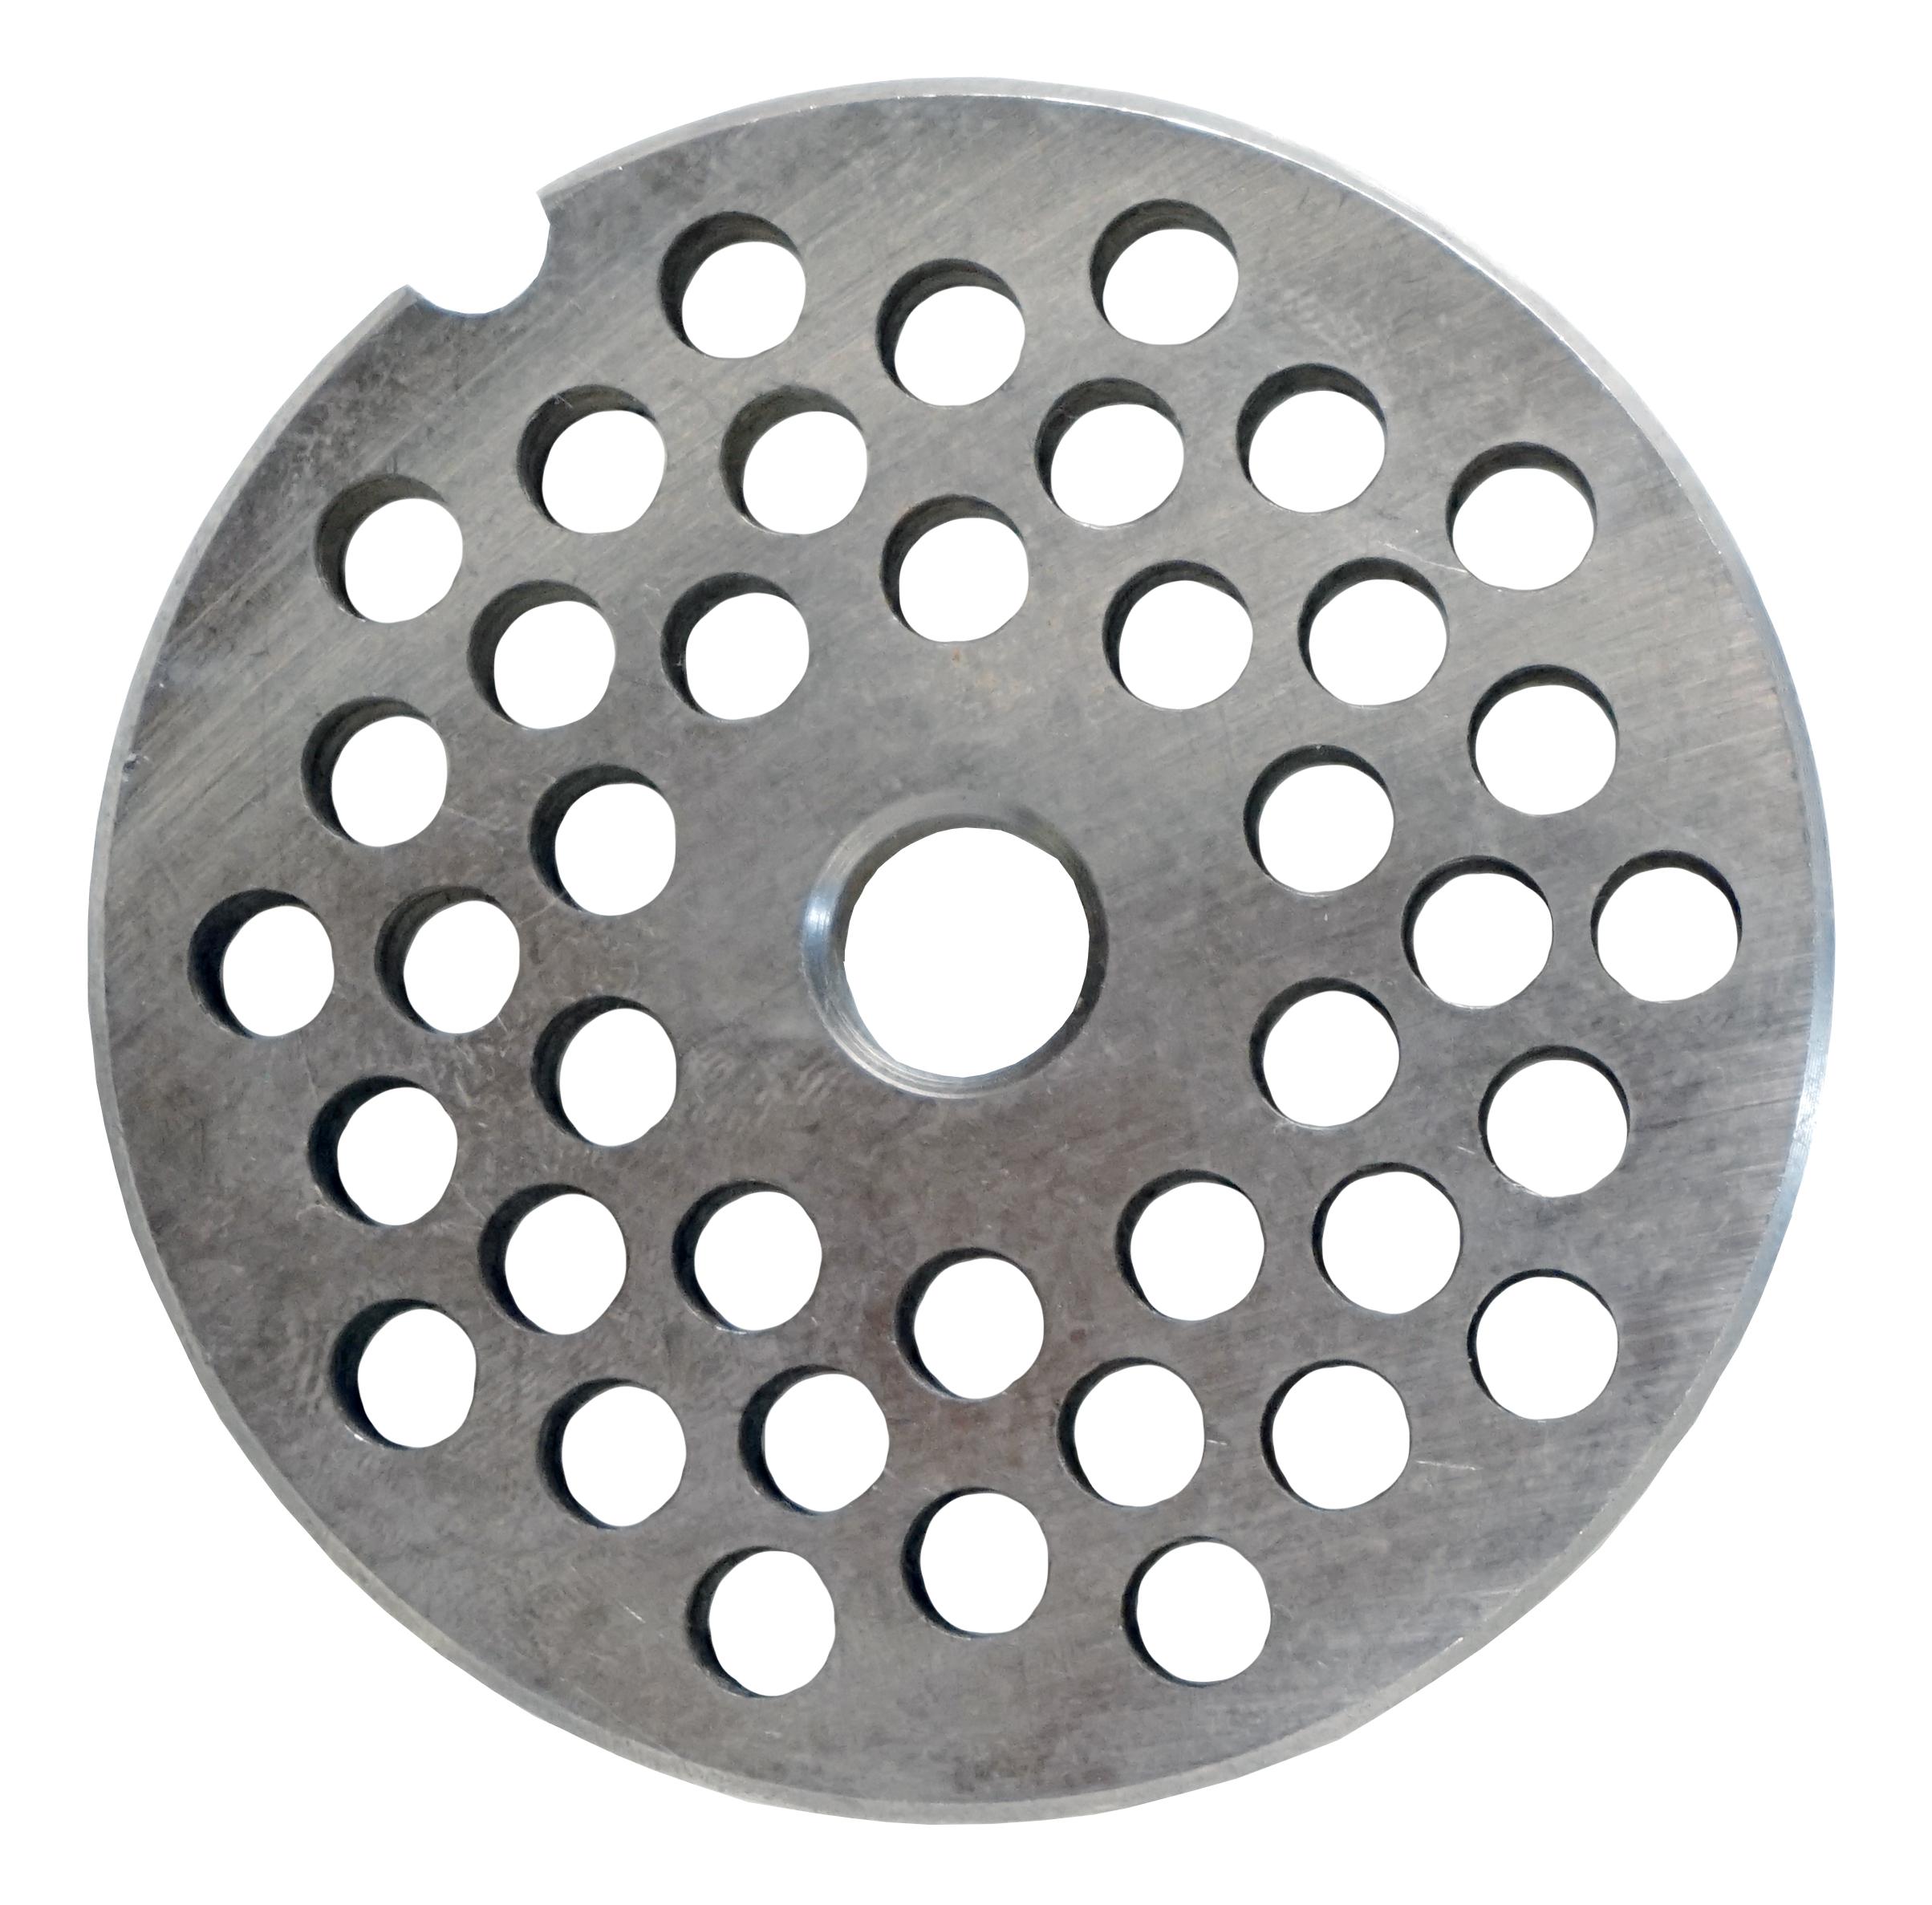 Globe L00439 meat grinder, accessories